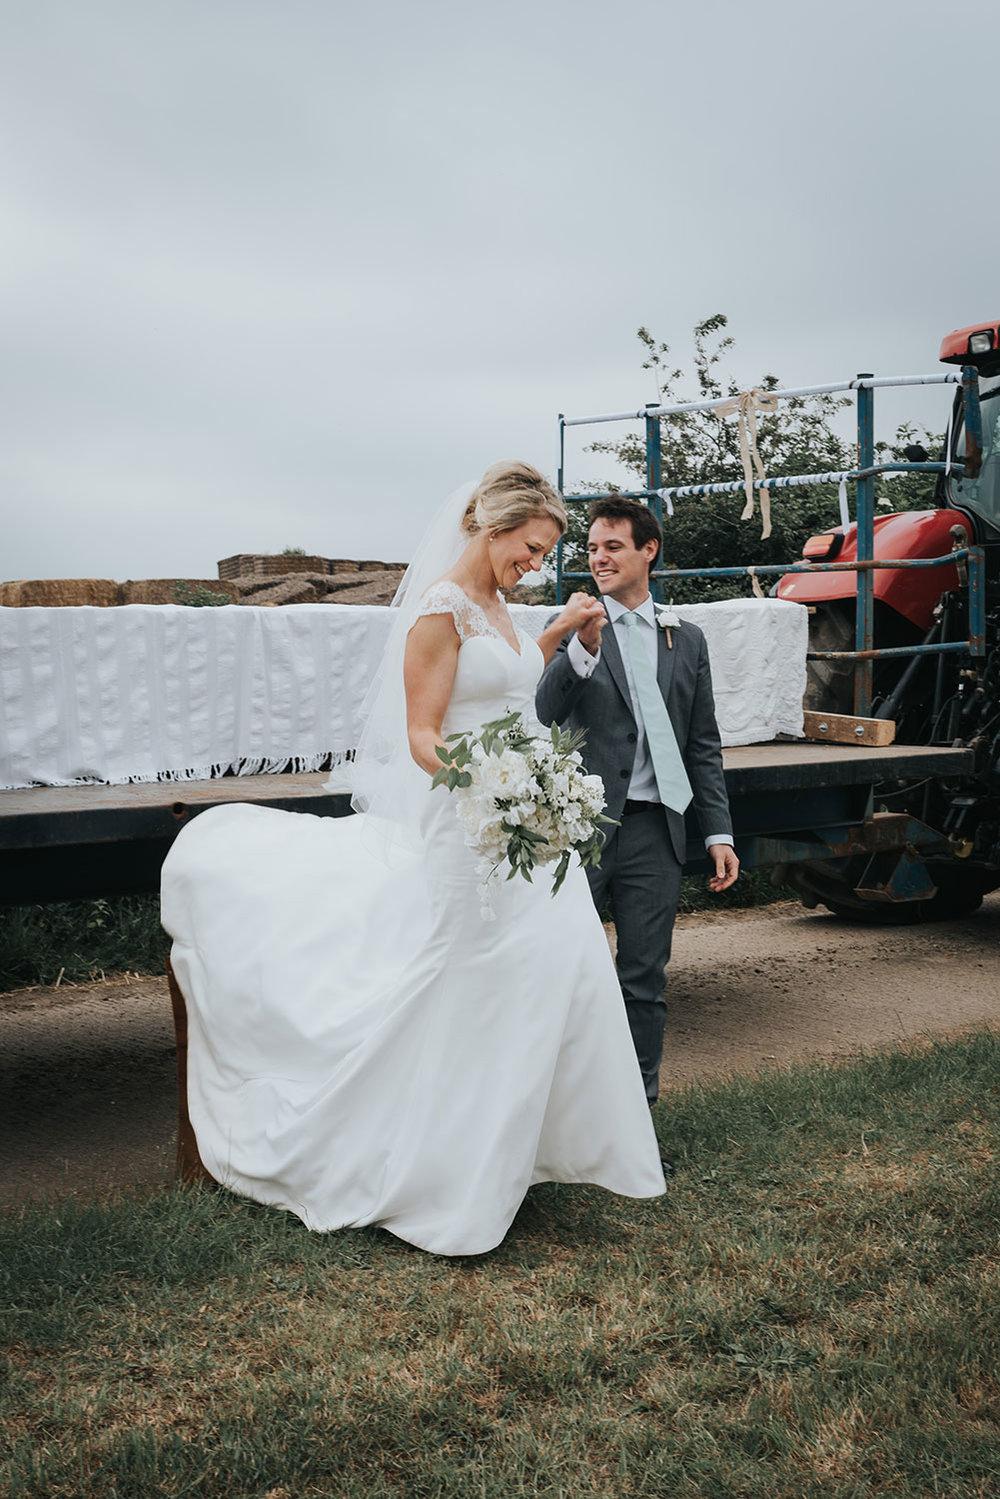 bryony-tom-essex-wedding-photographer-194.jpg